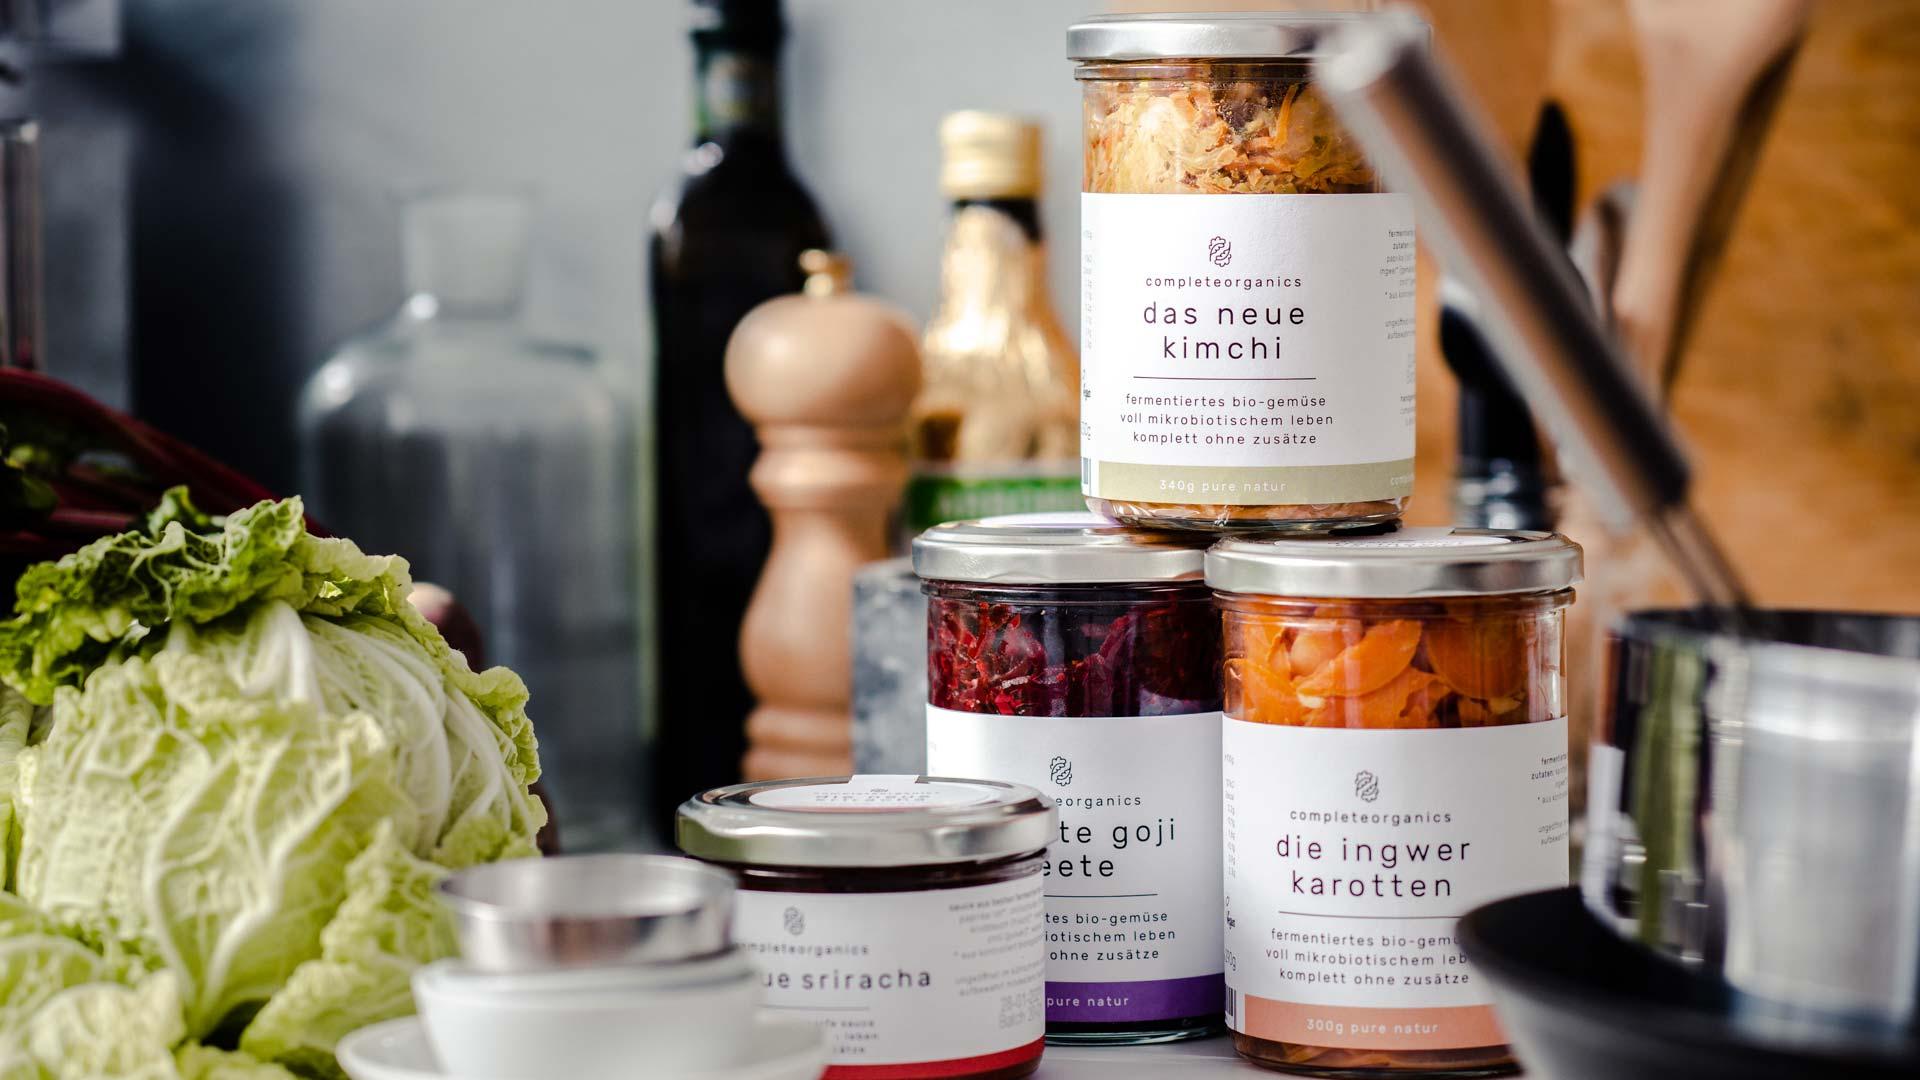 Complete organics Kimchi